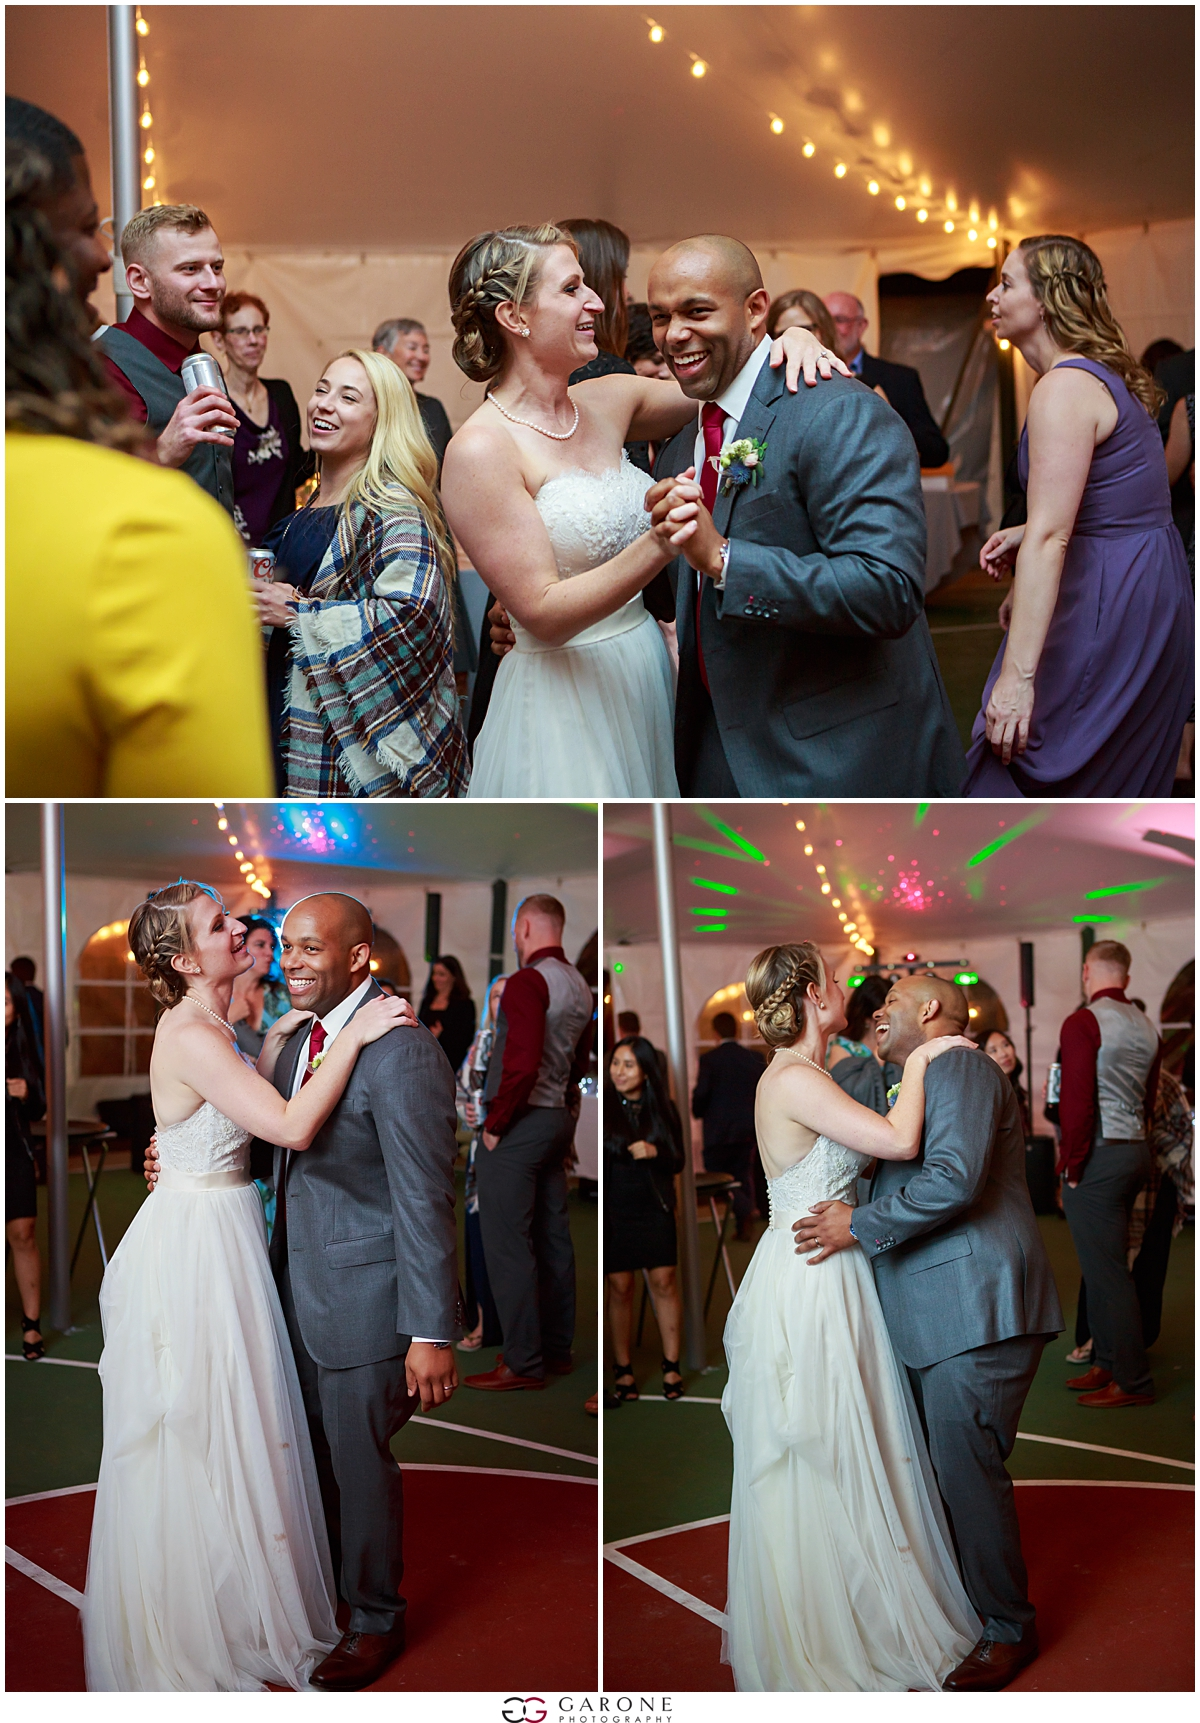 Kate_Matt_Backyard_Lake_Wedding_Garone_Photography_NH_Wedding_0033.jpg